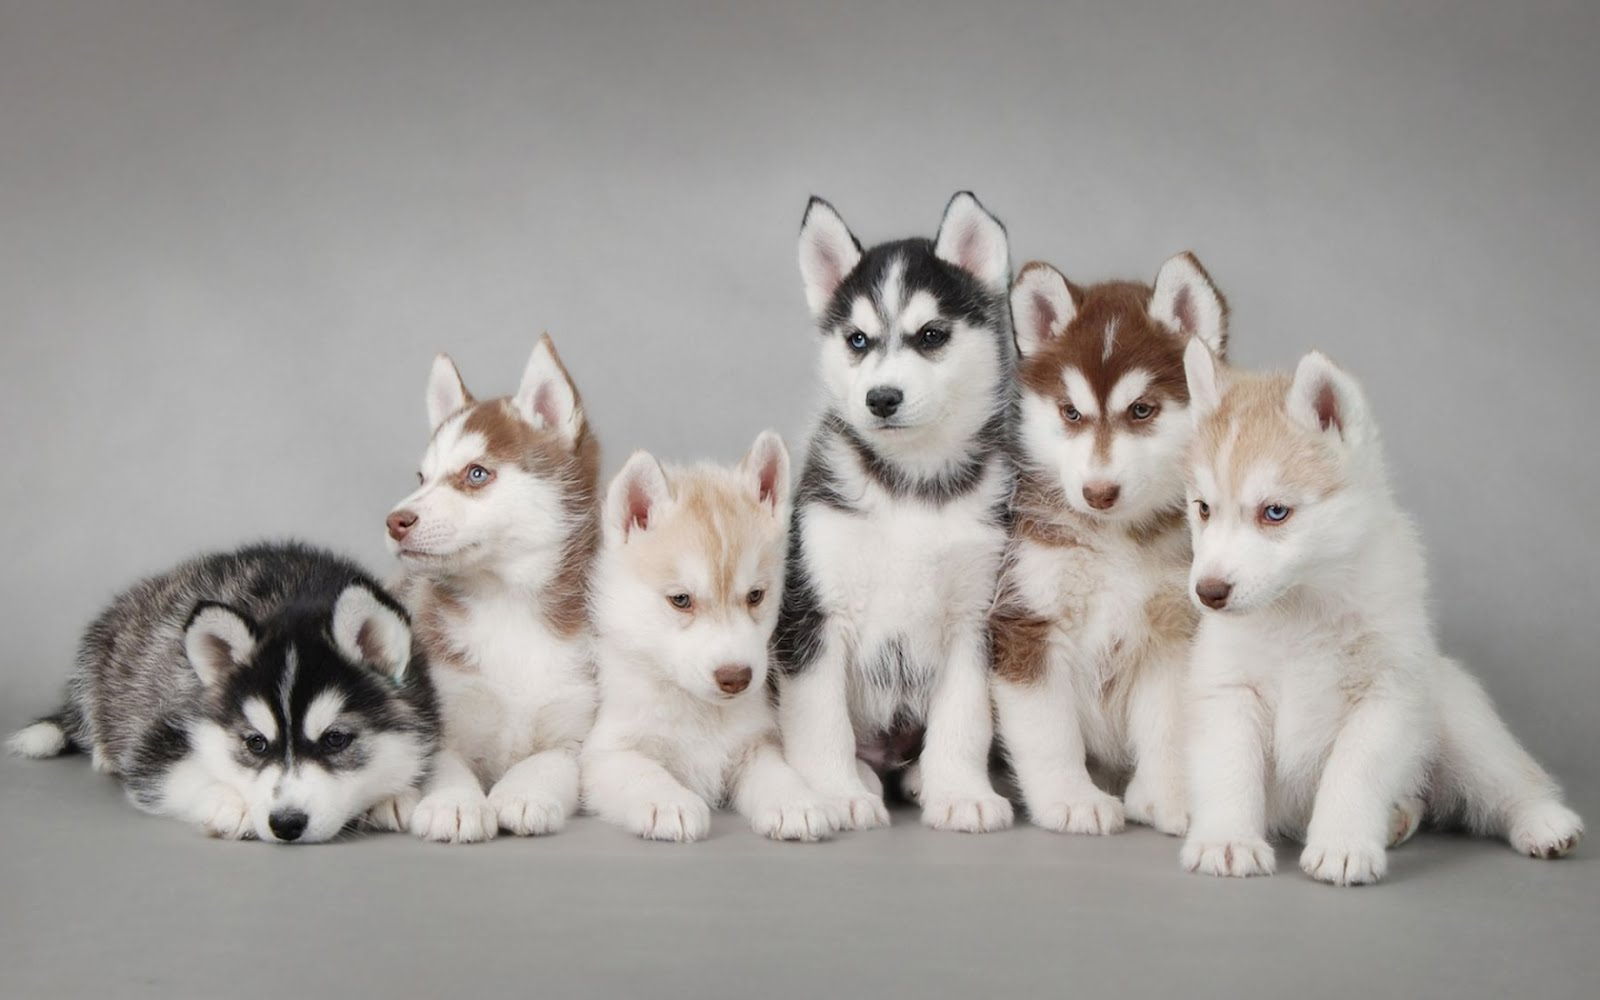 Siberian Husky Puppies Hd Desktop Wallpaper Puppy